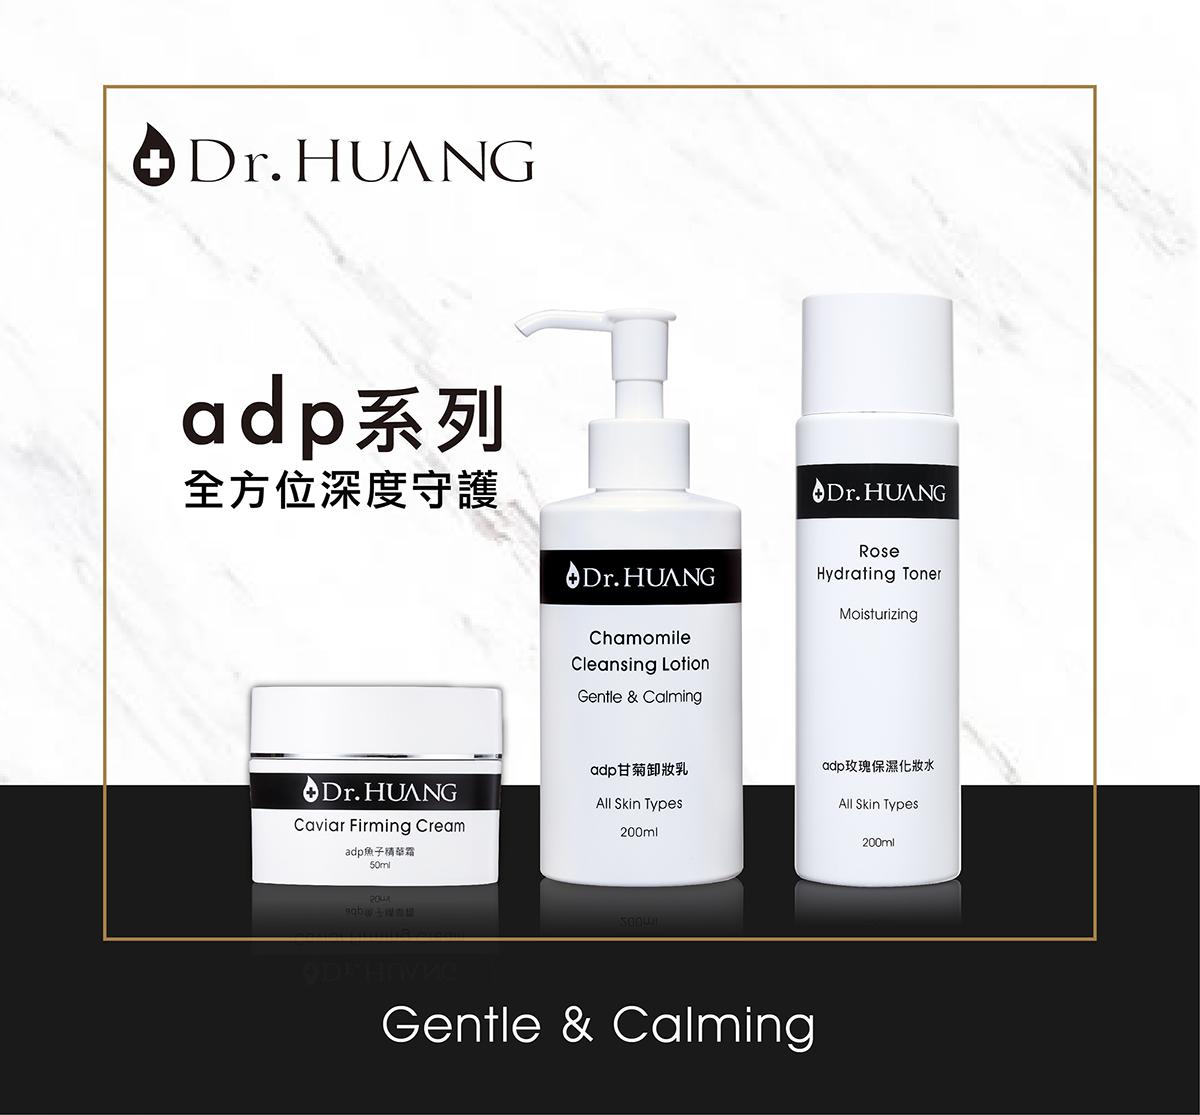 Dr.HUANGadp系列甘菊卸妝乳